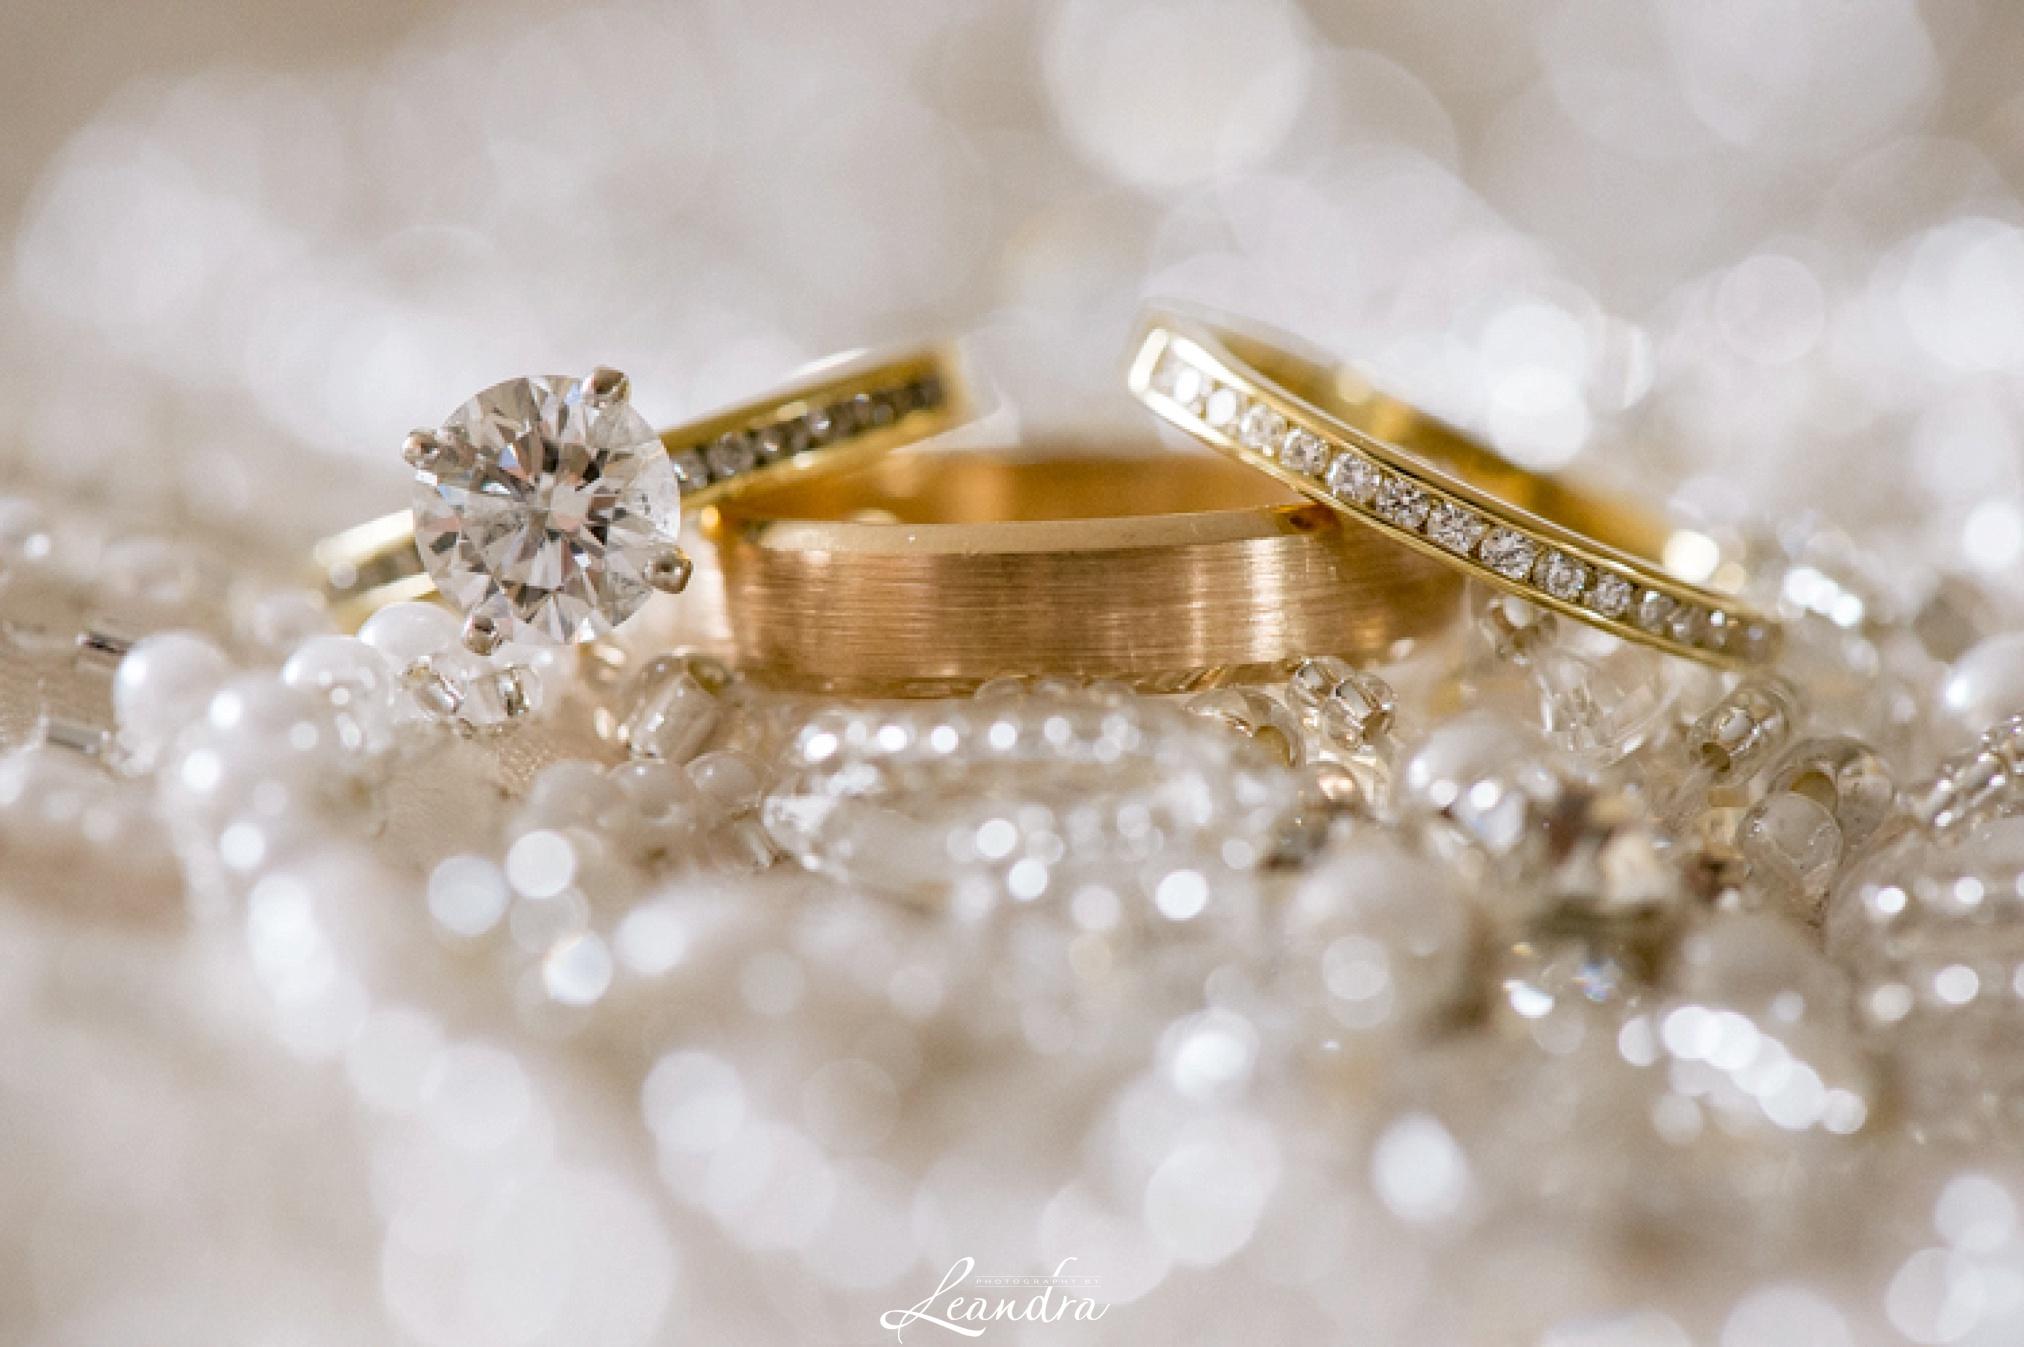 PhotographybyLeandra.WeddingRings_0449.jpg